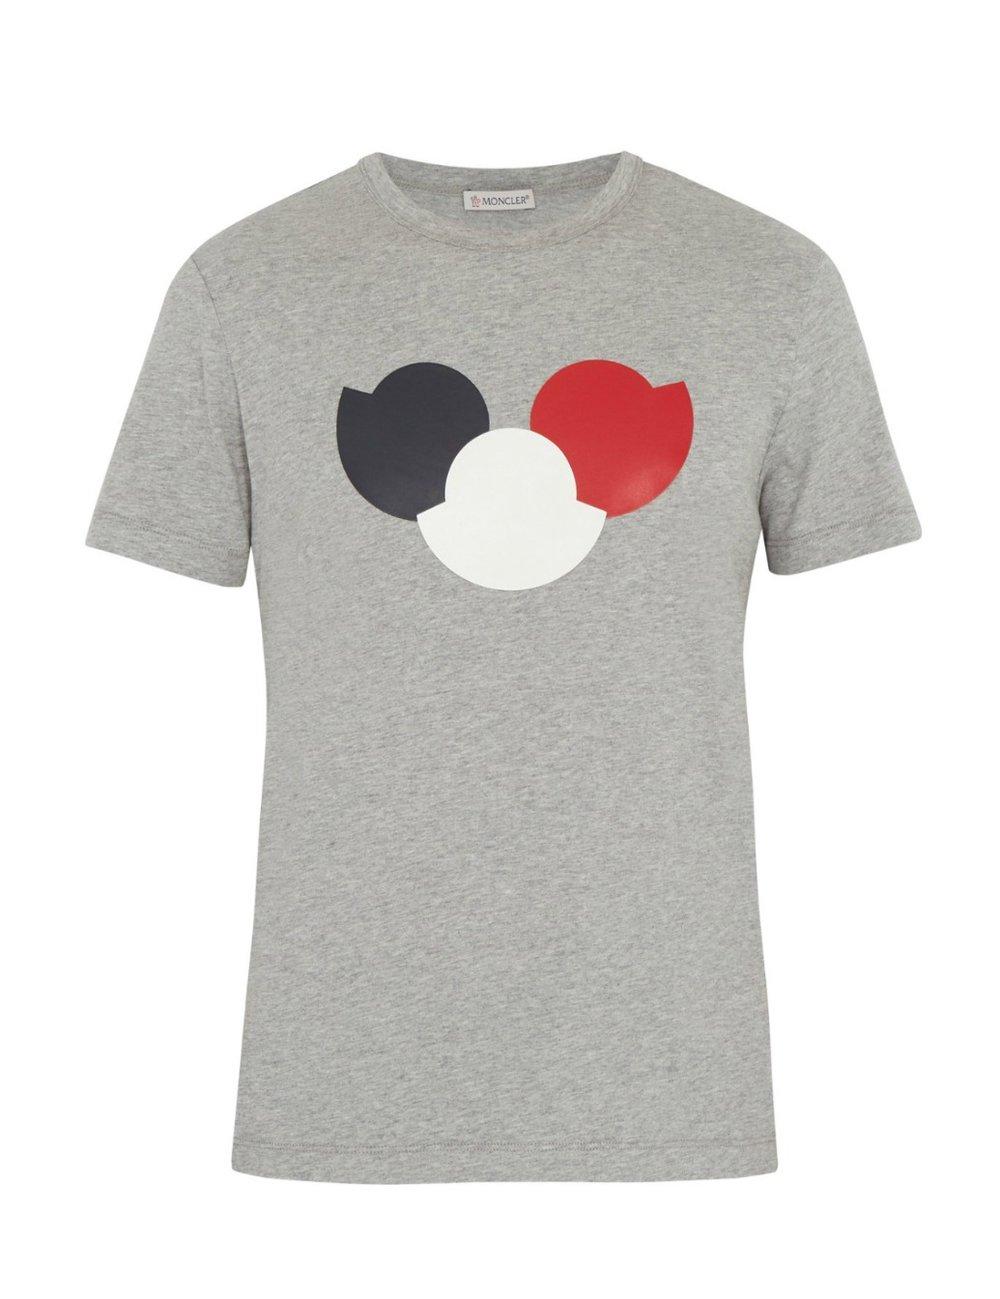 MONCLERLogo-print cotton-jersey tshirt - MATCHESFASHION.COM